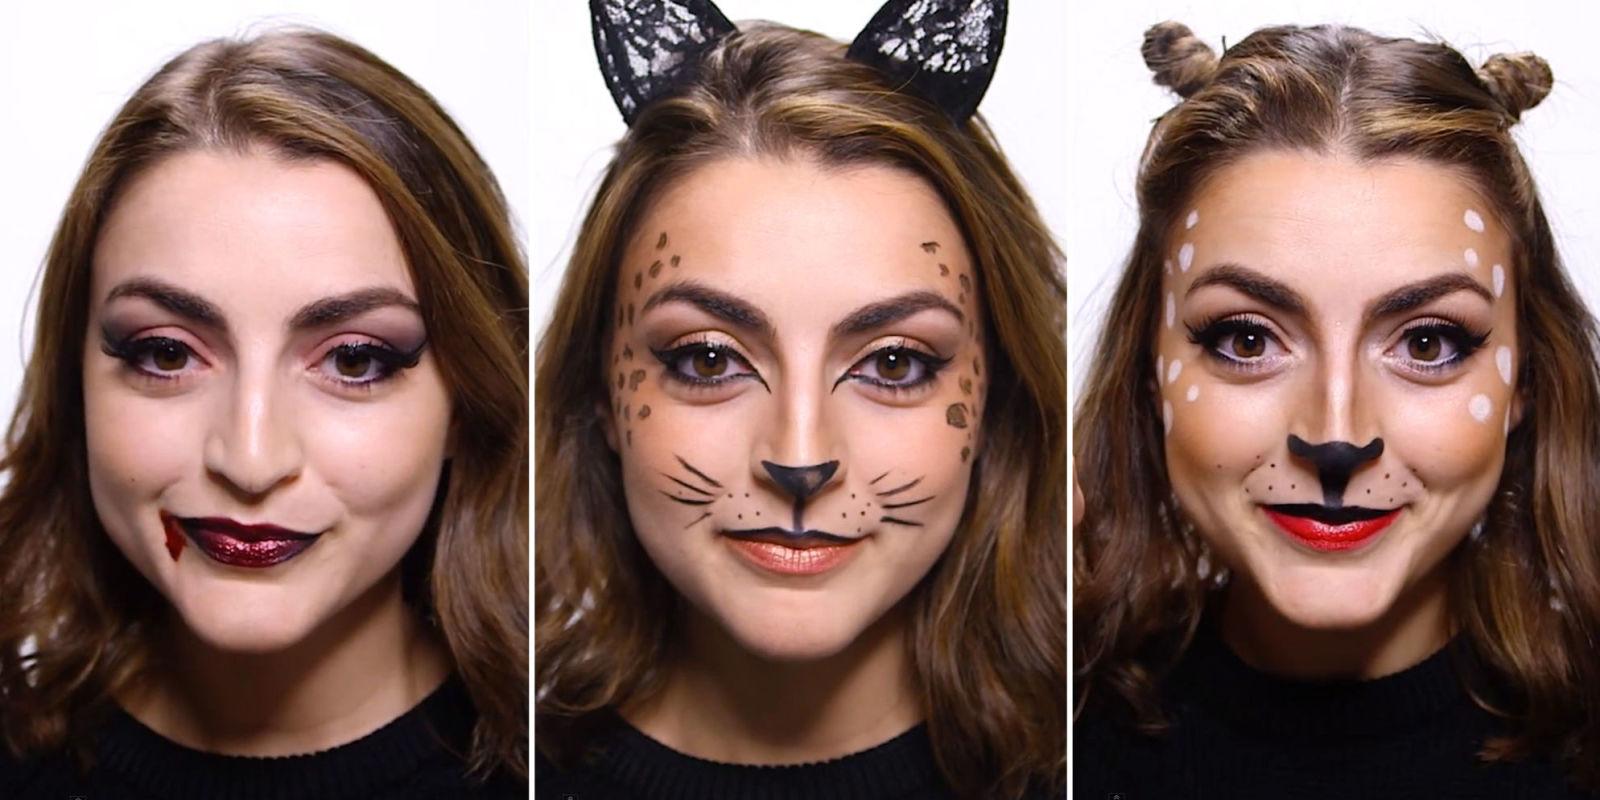 How To Do Your Makeup For College | Saubhaya Makeup